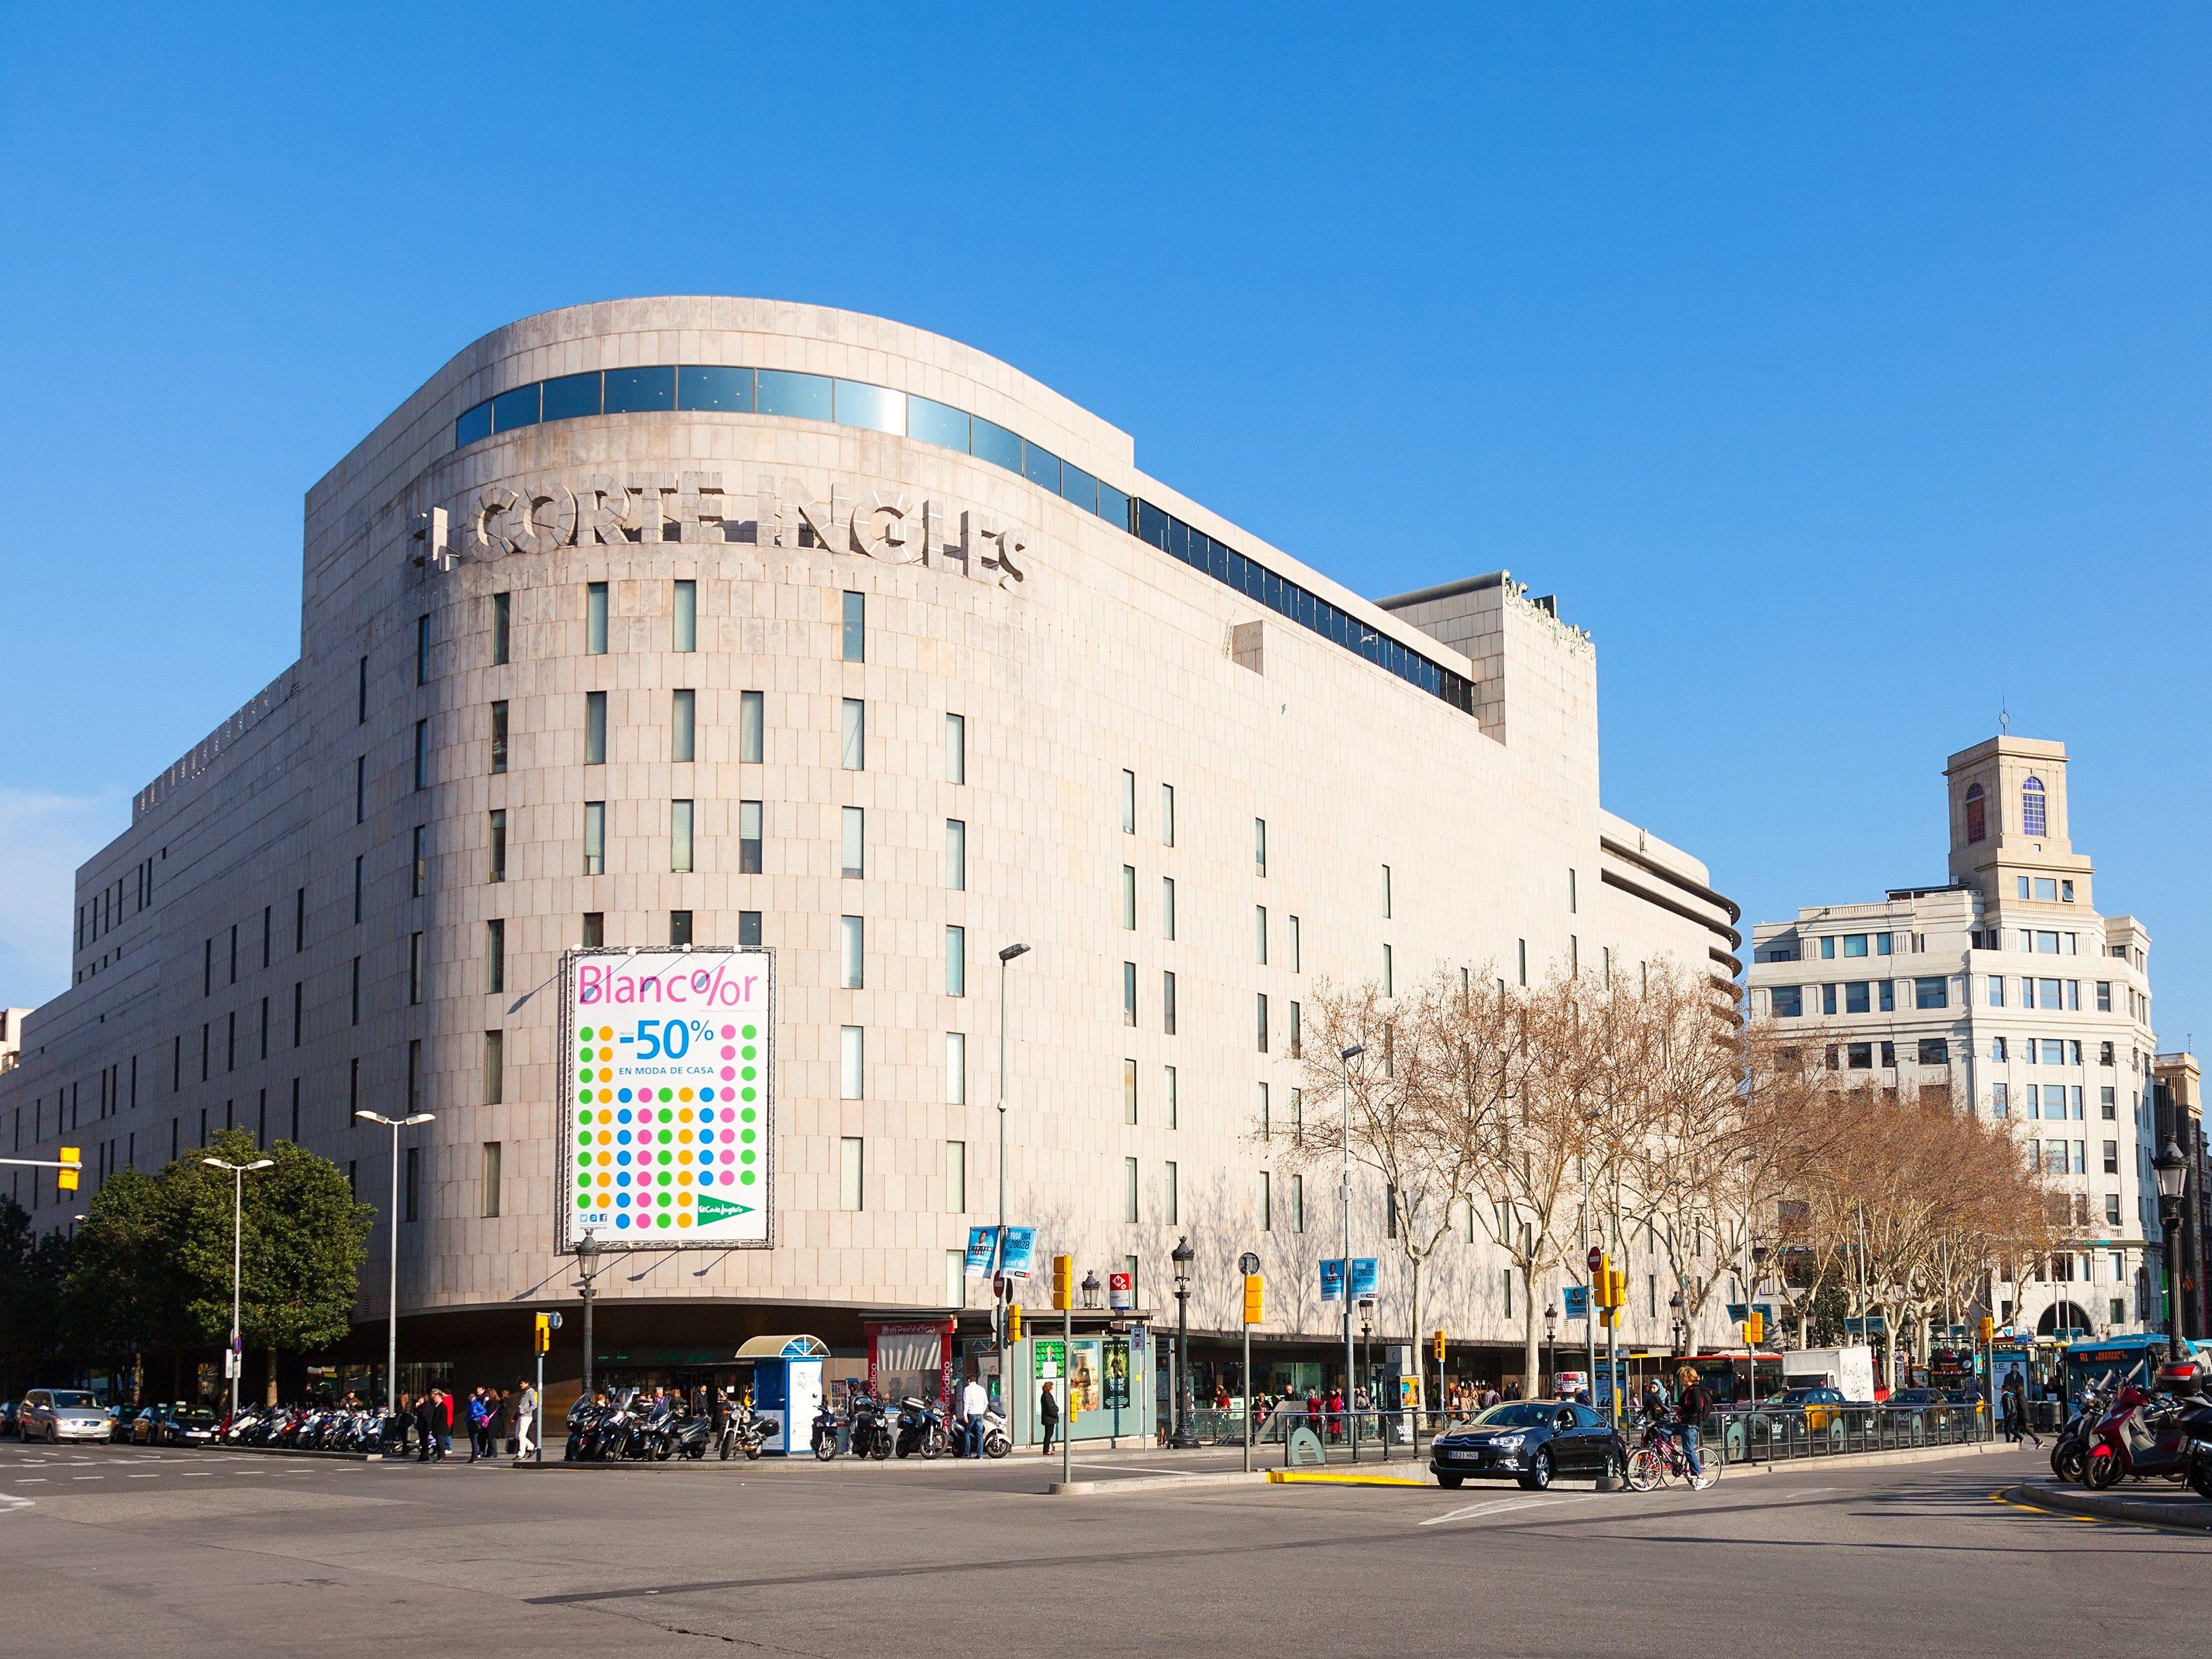 10. El Corte Ingles, Lisbon, Madrid and Barcelona